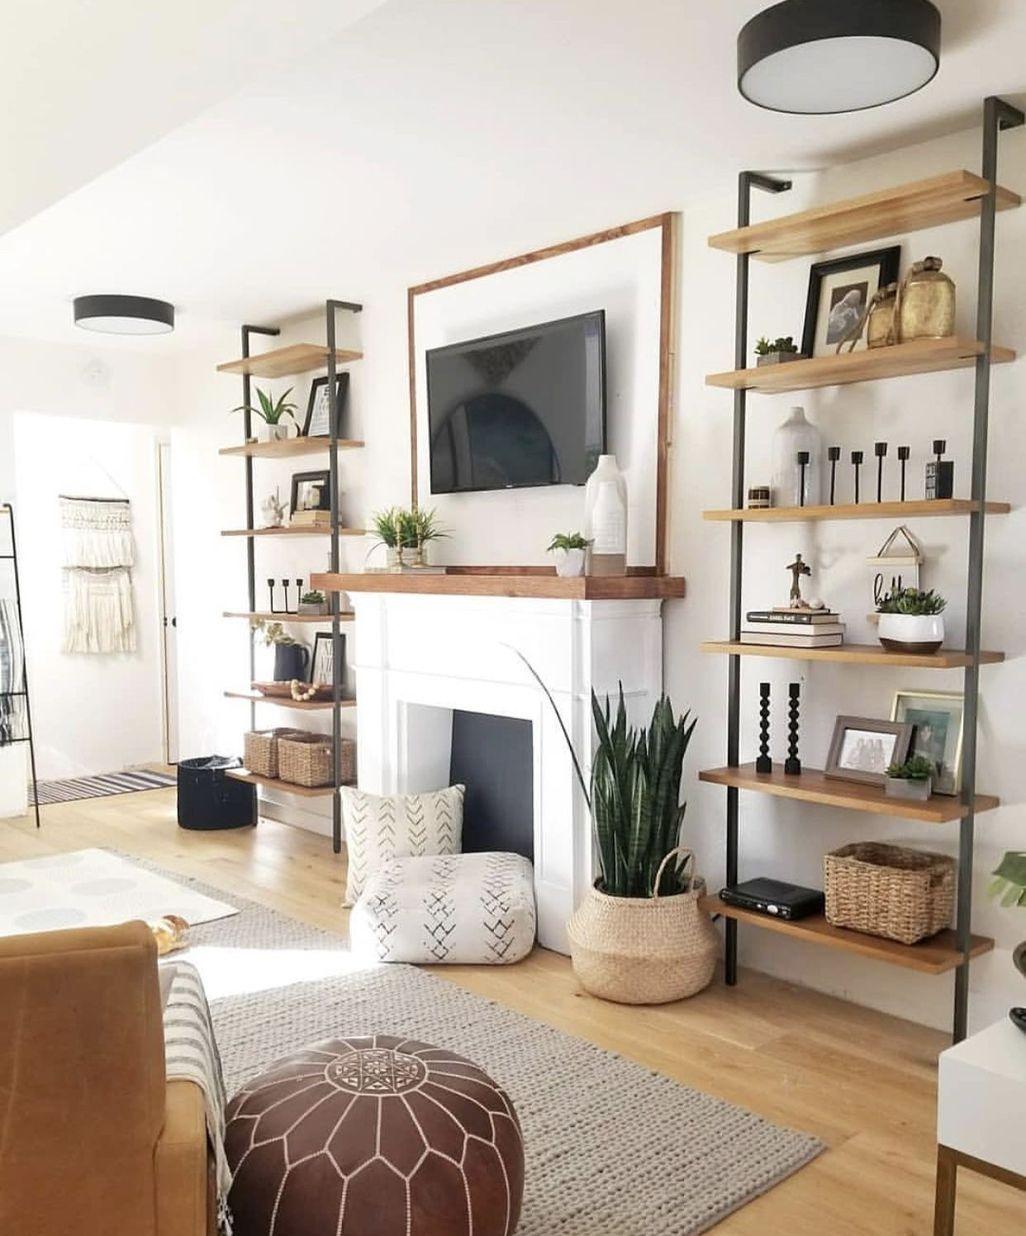 44 Brilliant Diy Rustic Home Decor Ideas For Living Room Diseno